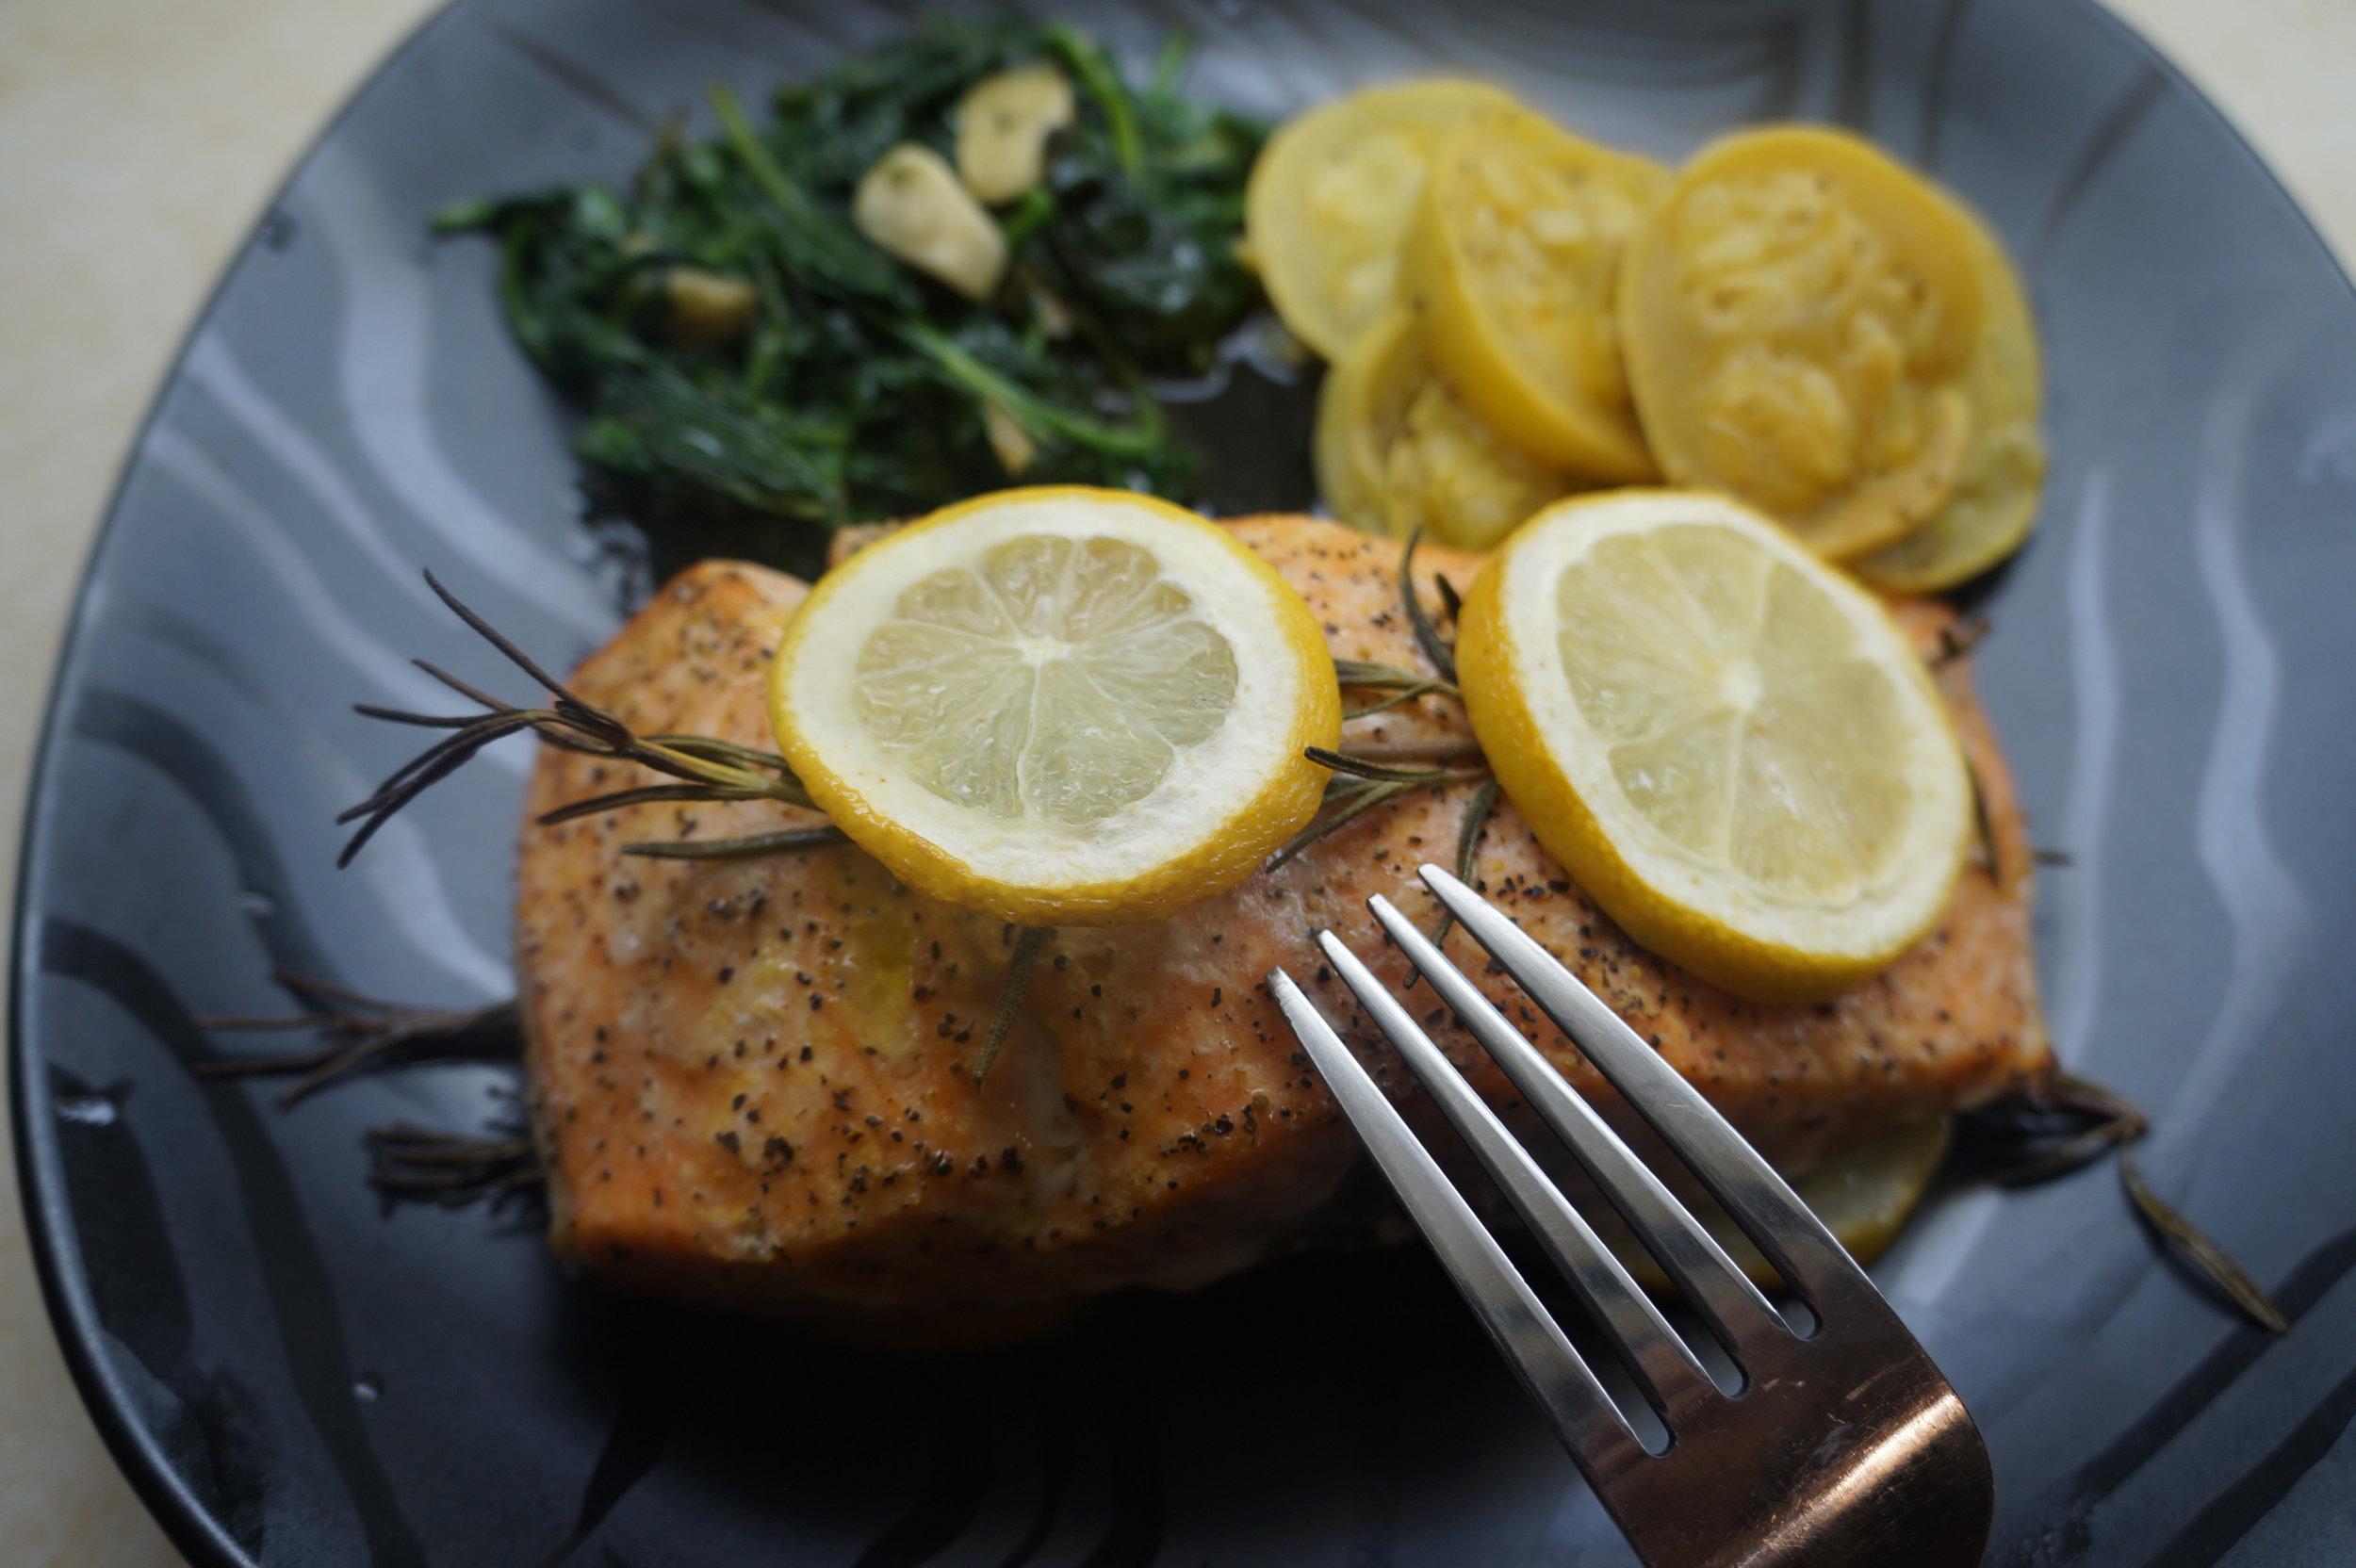 Andrea Fenise Lemon and Rosemary Baked Salmon Recipe